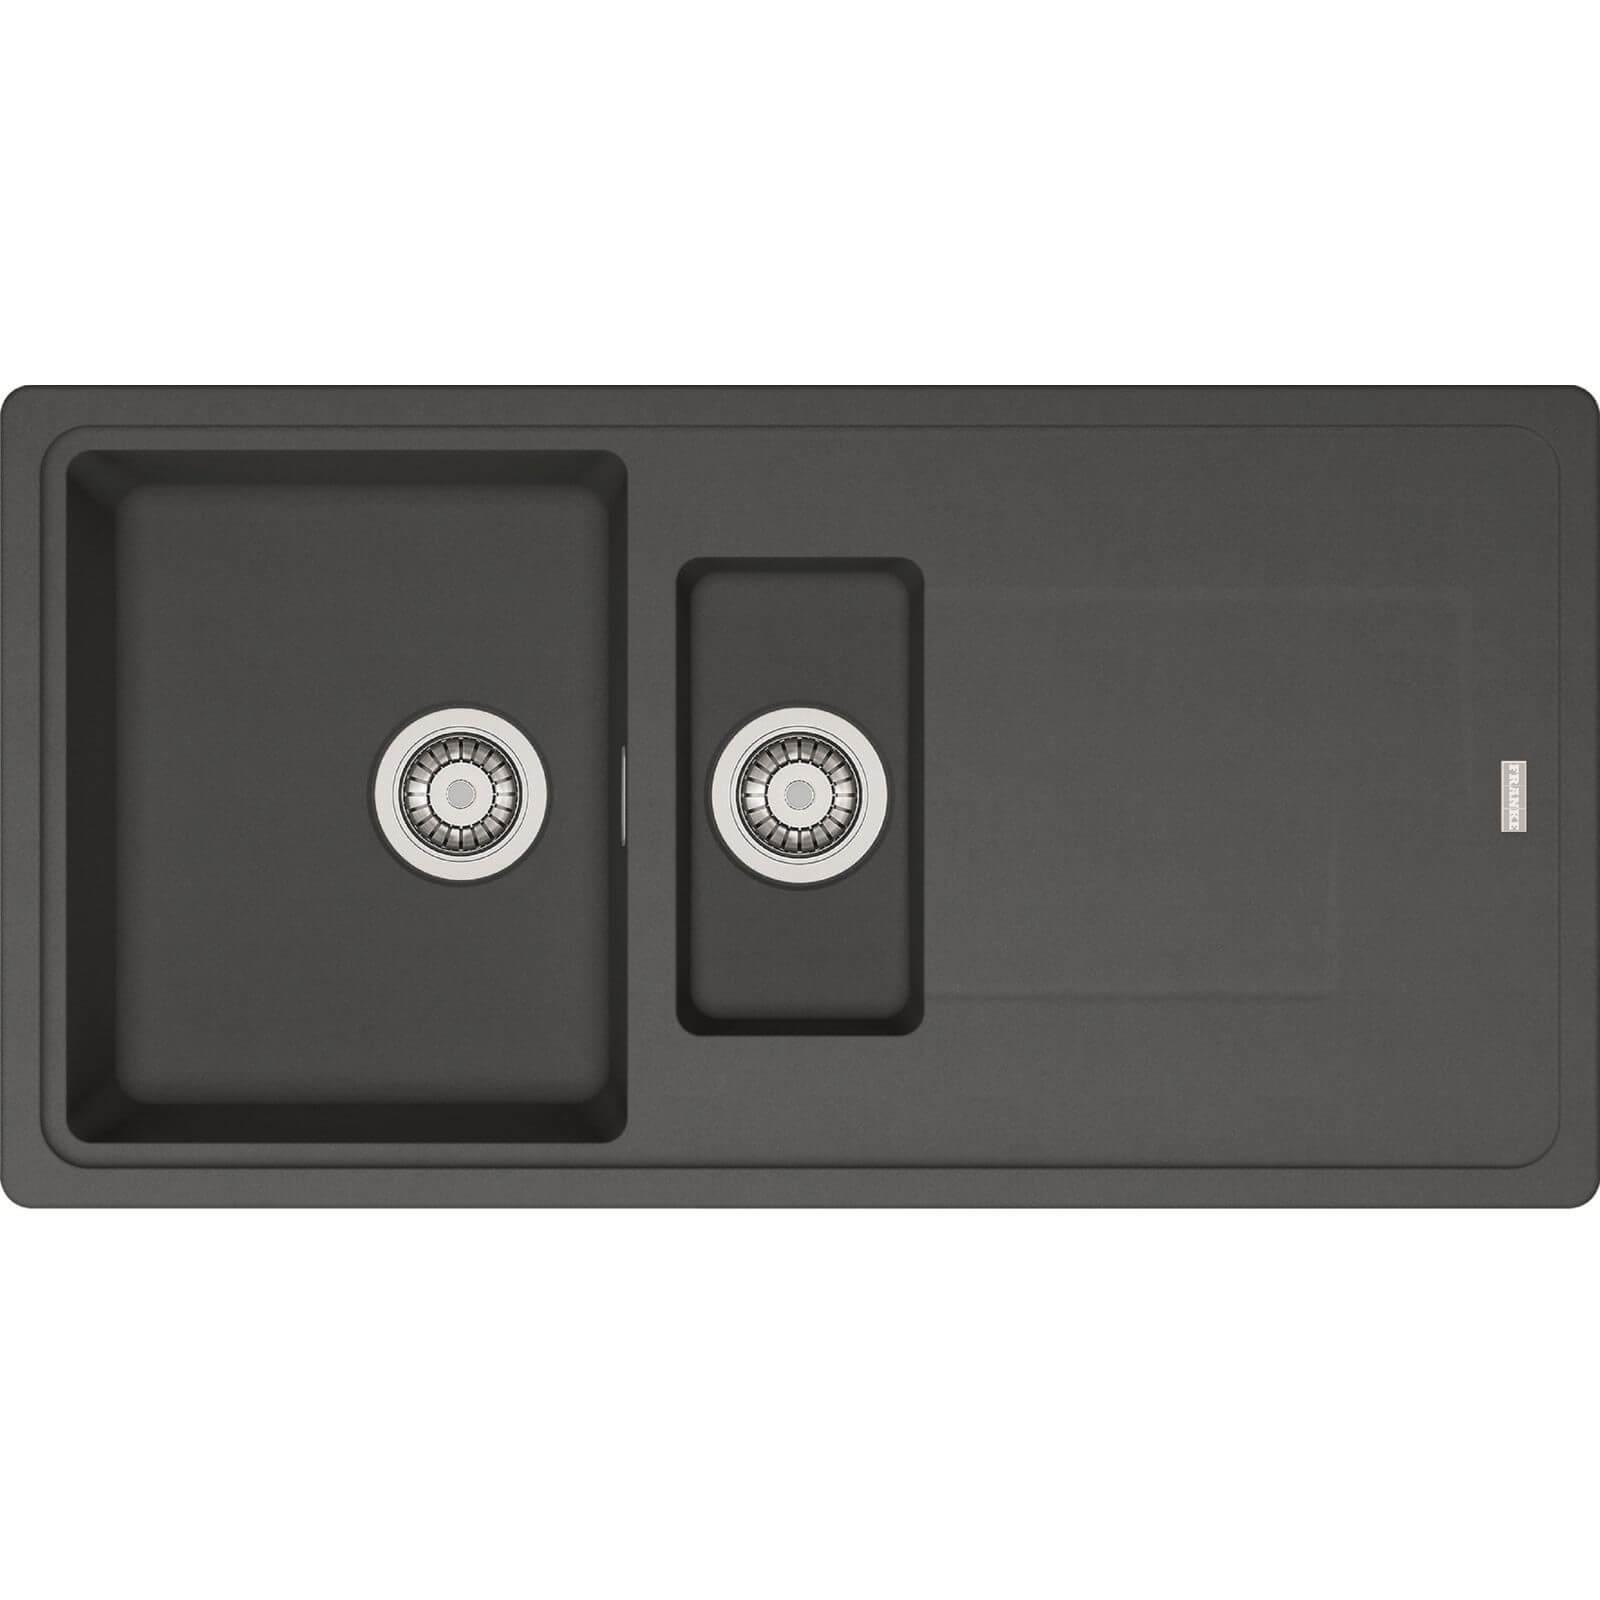 Franke Gemini Black Reversible Kitchen Sink - 1.5 Bowl